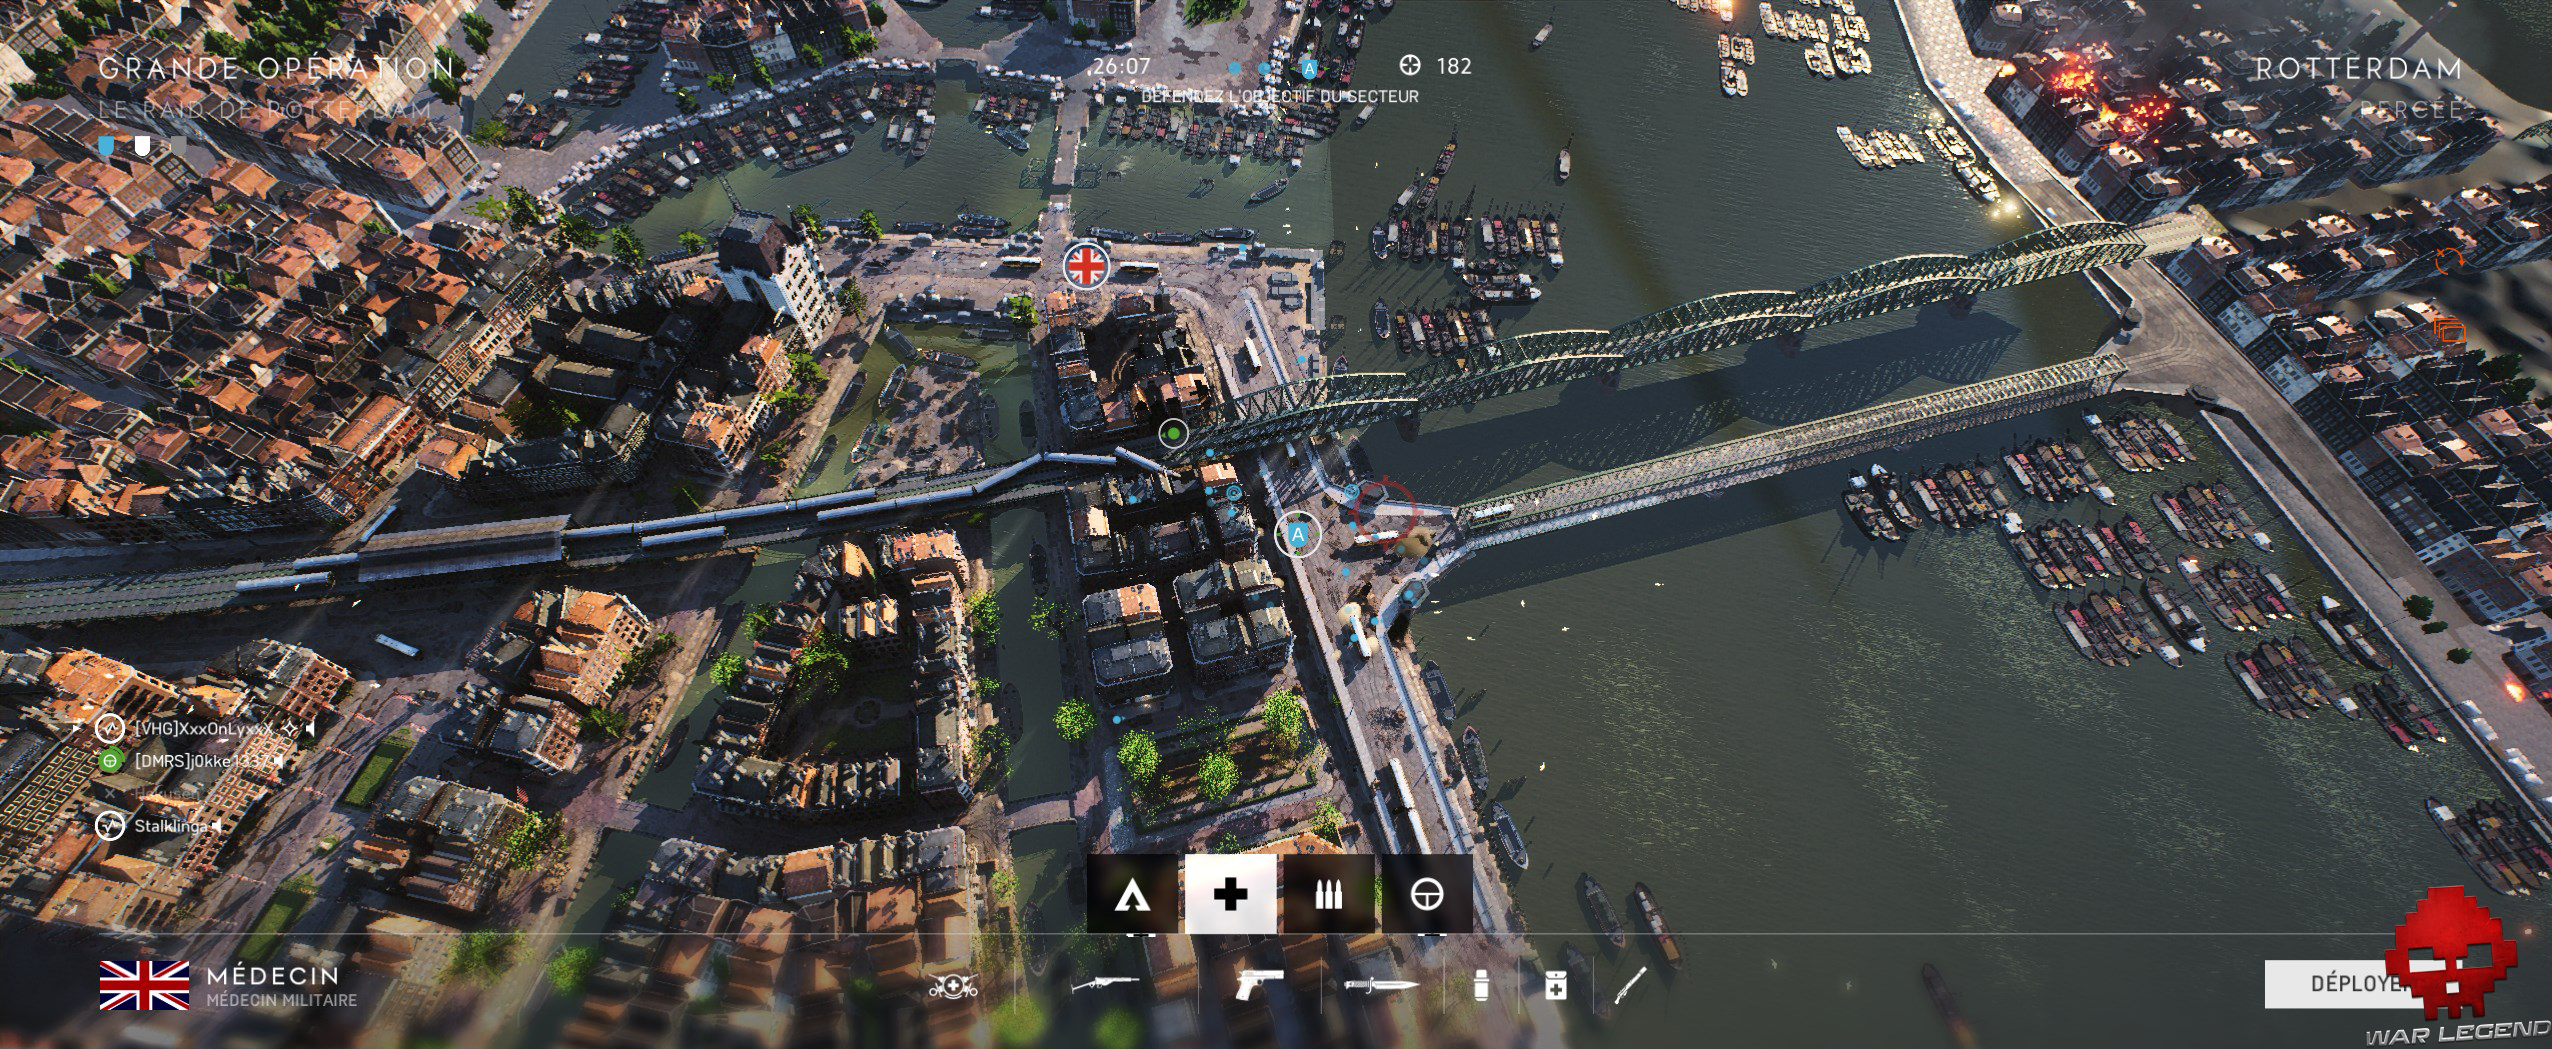 Test Battlefield V - Carte La Percée de Rotterdam durant la Grande Opération